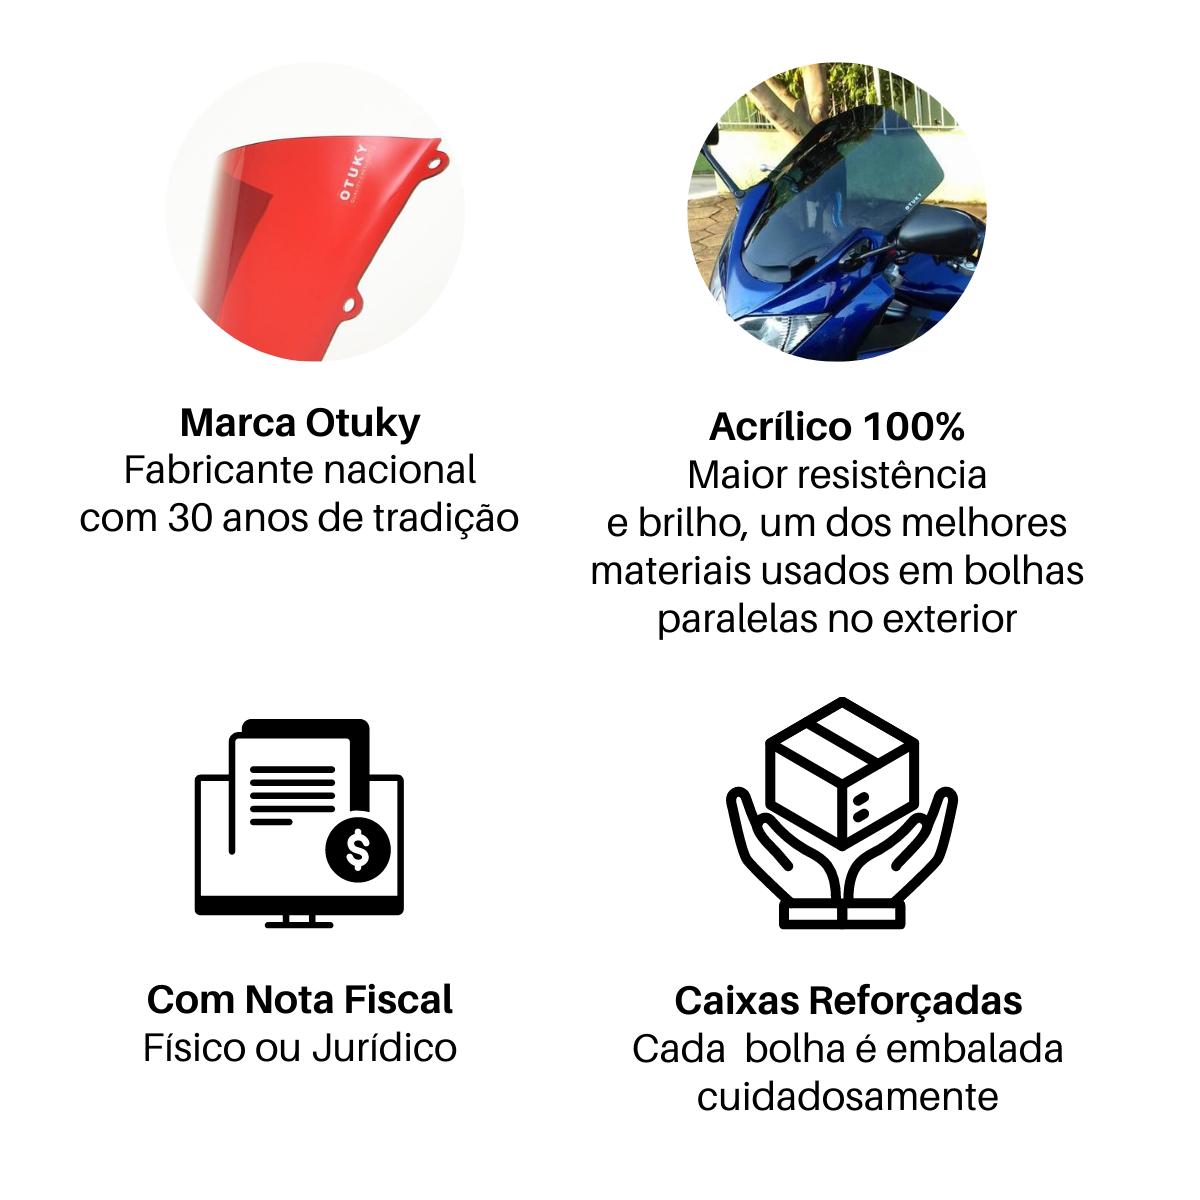 Bolha para Moto GSX 1300 R Hayabusa 1999 2000 2001 2002 2003 2004 2005 2006 2007 Otuky Fumê Cinza-Claro